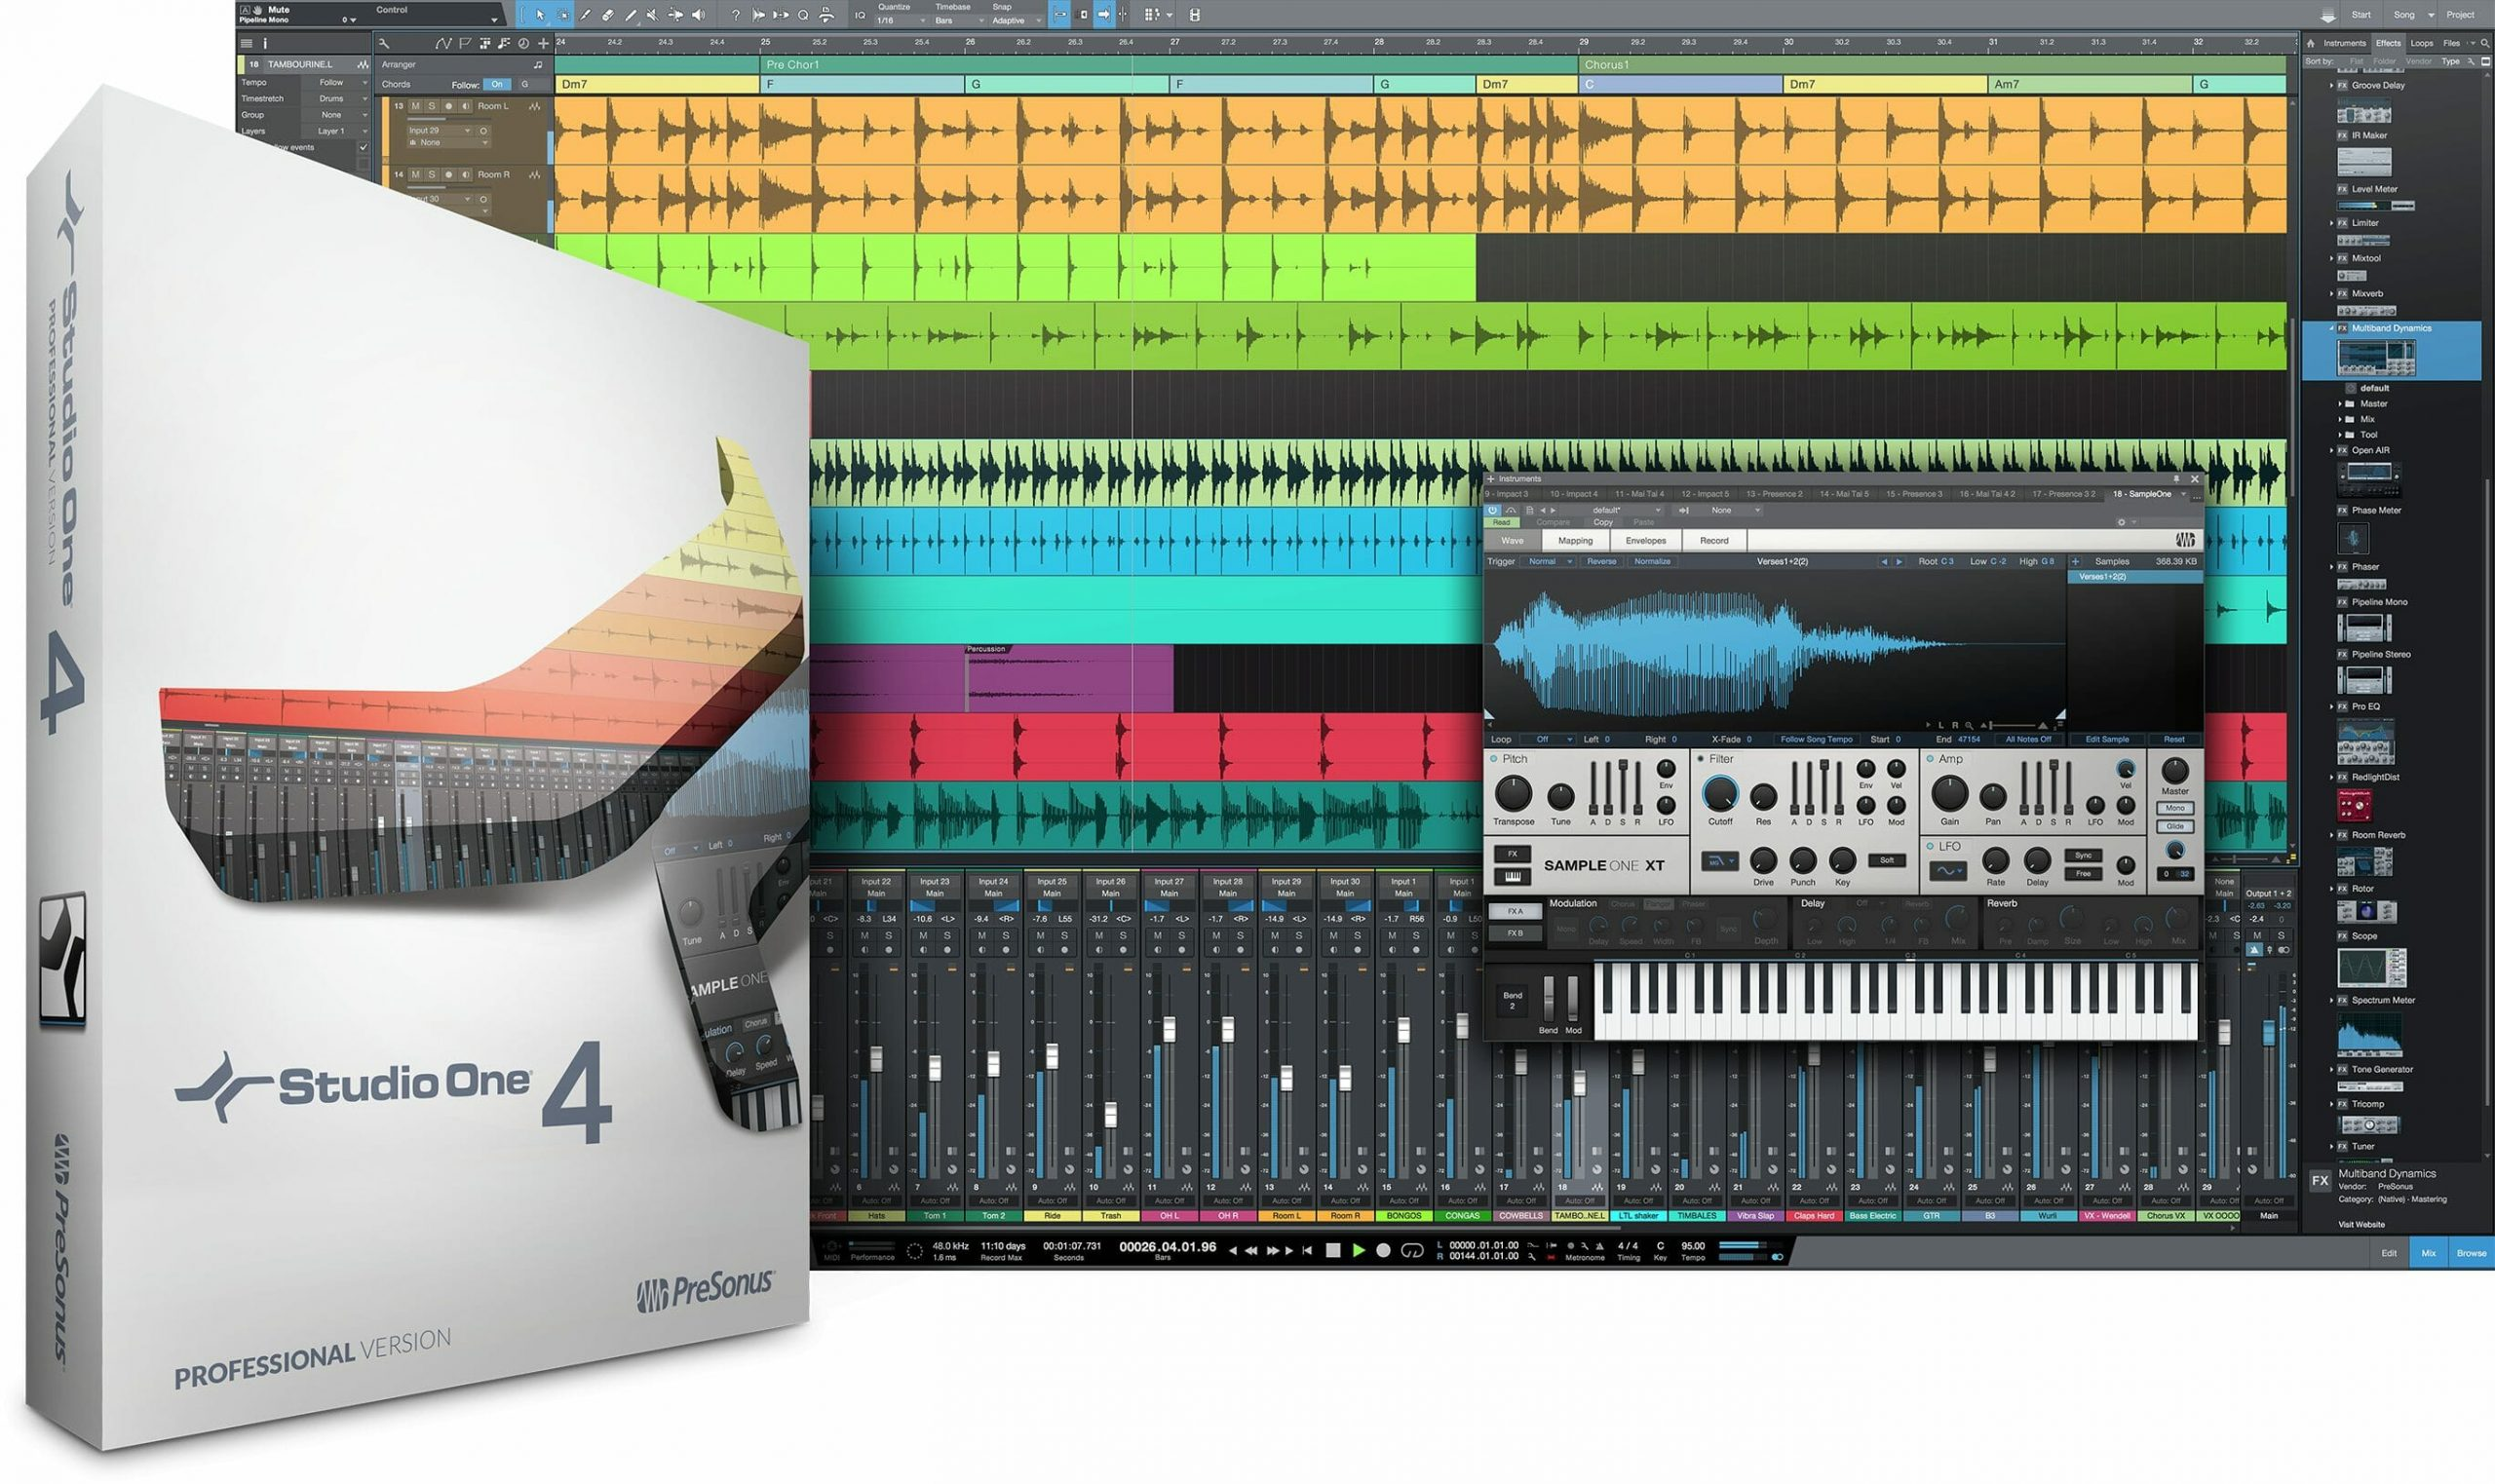 PreSonus Studio One Pro Crack 5.4.0 With Full Download [Latest] 2021